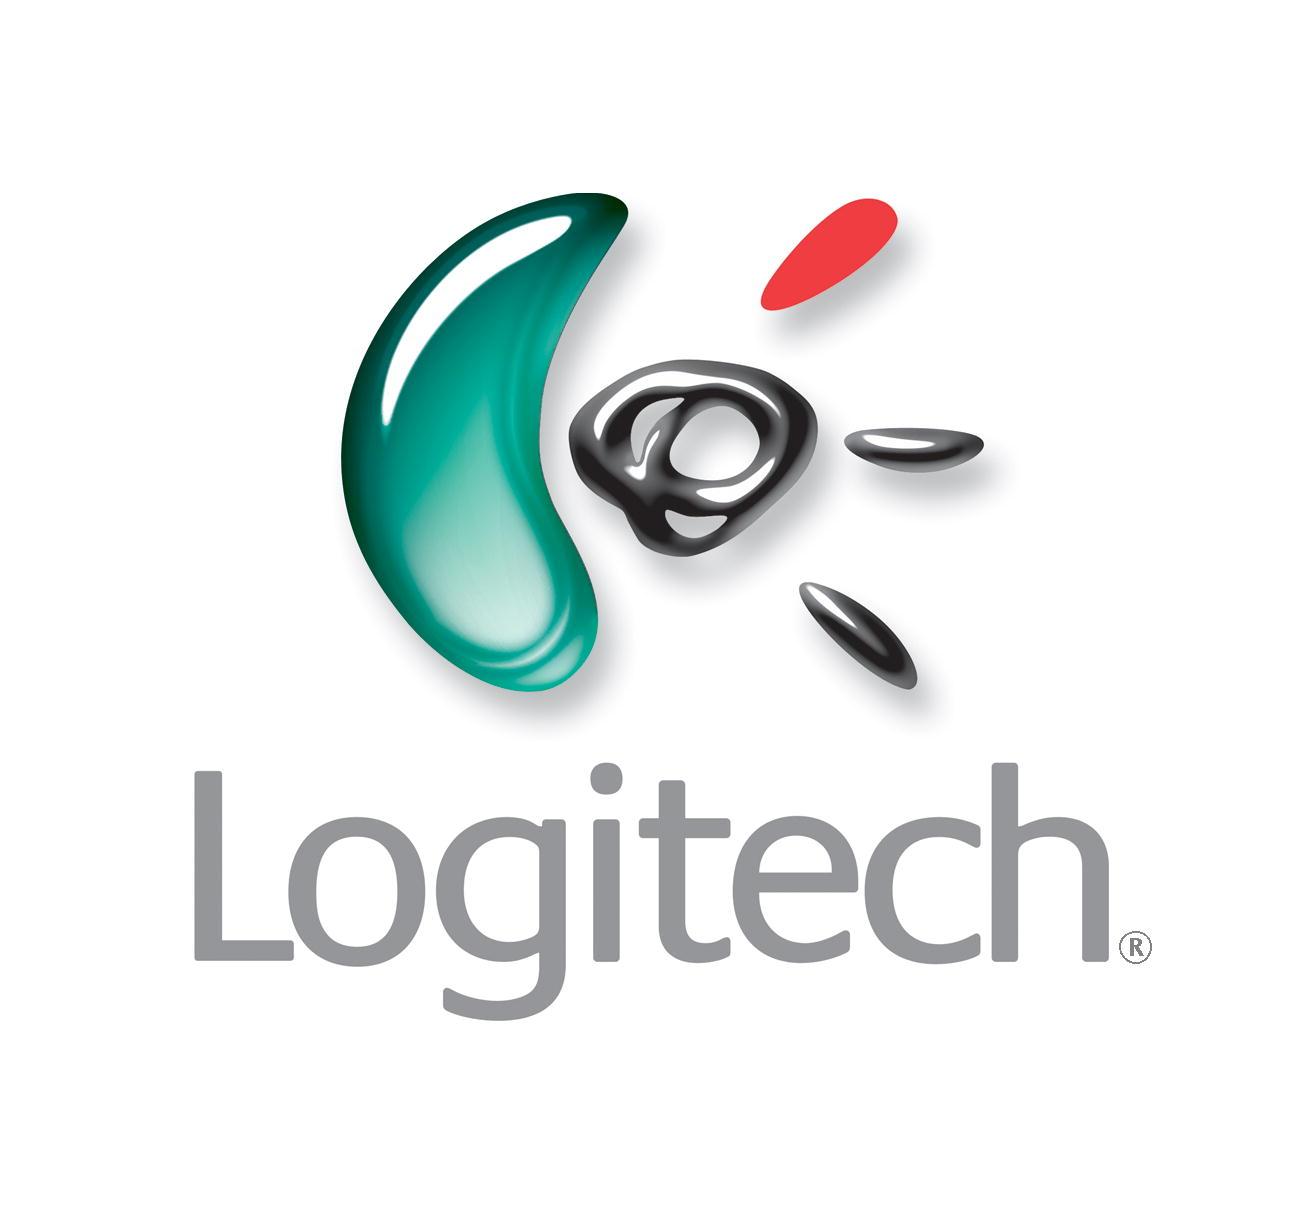 Logitech recrute pour Android